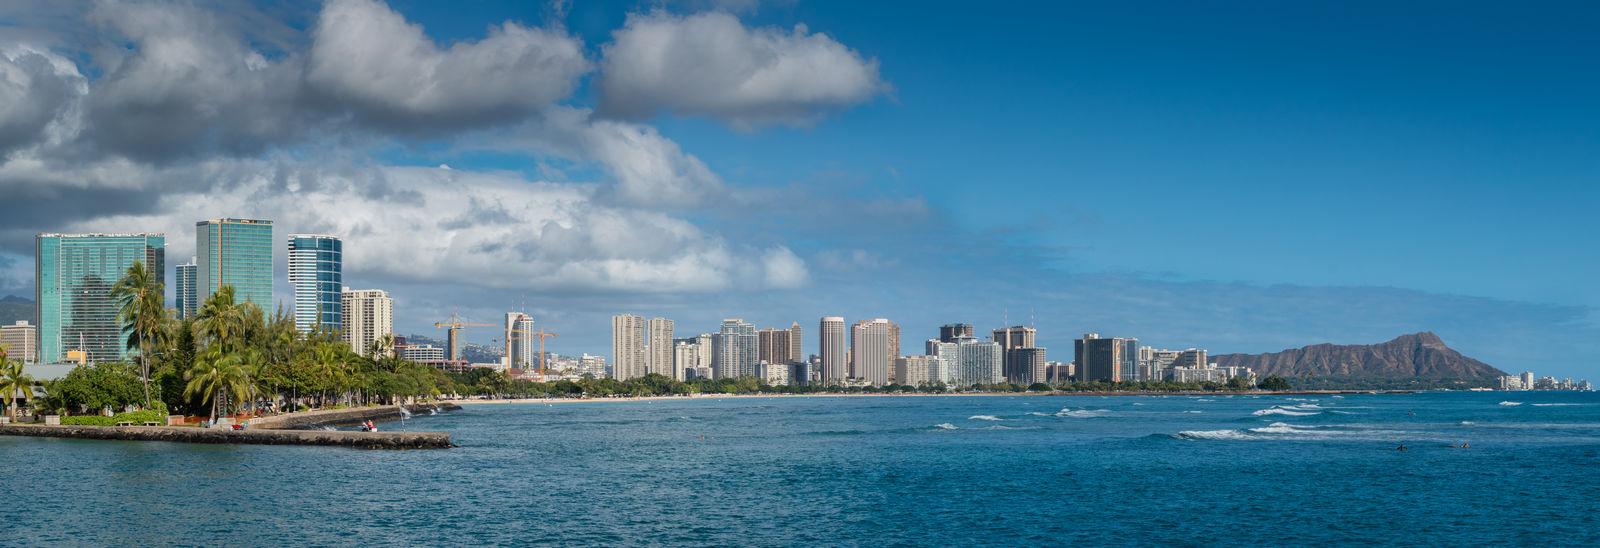 Ala Moana Blackandwhite Blue Sky Cityscape Cityscape Cityscapes Diamond Head Diamondhead Ocean Outdoors Panorama Panoramic Photography Sky Tower Waikiki Water Waterfront